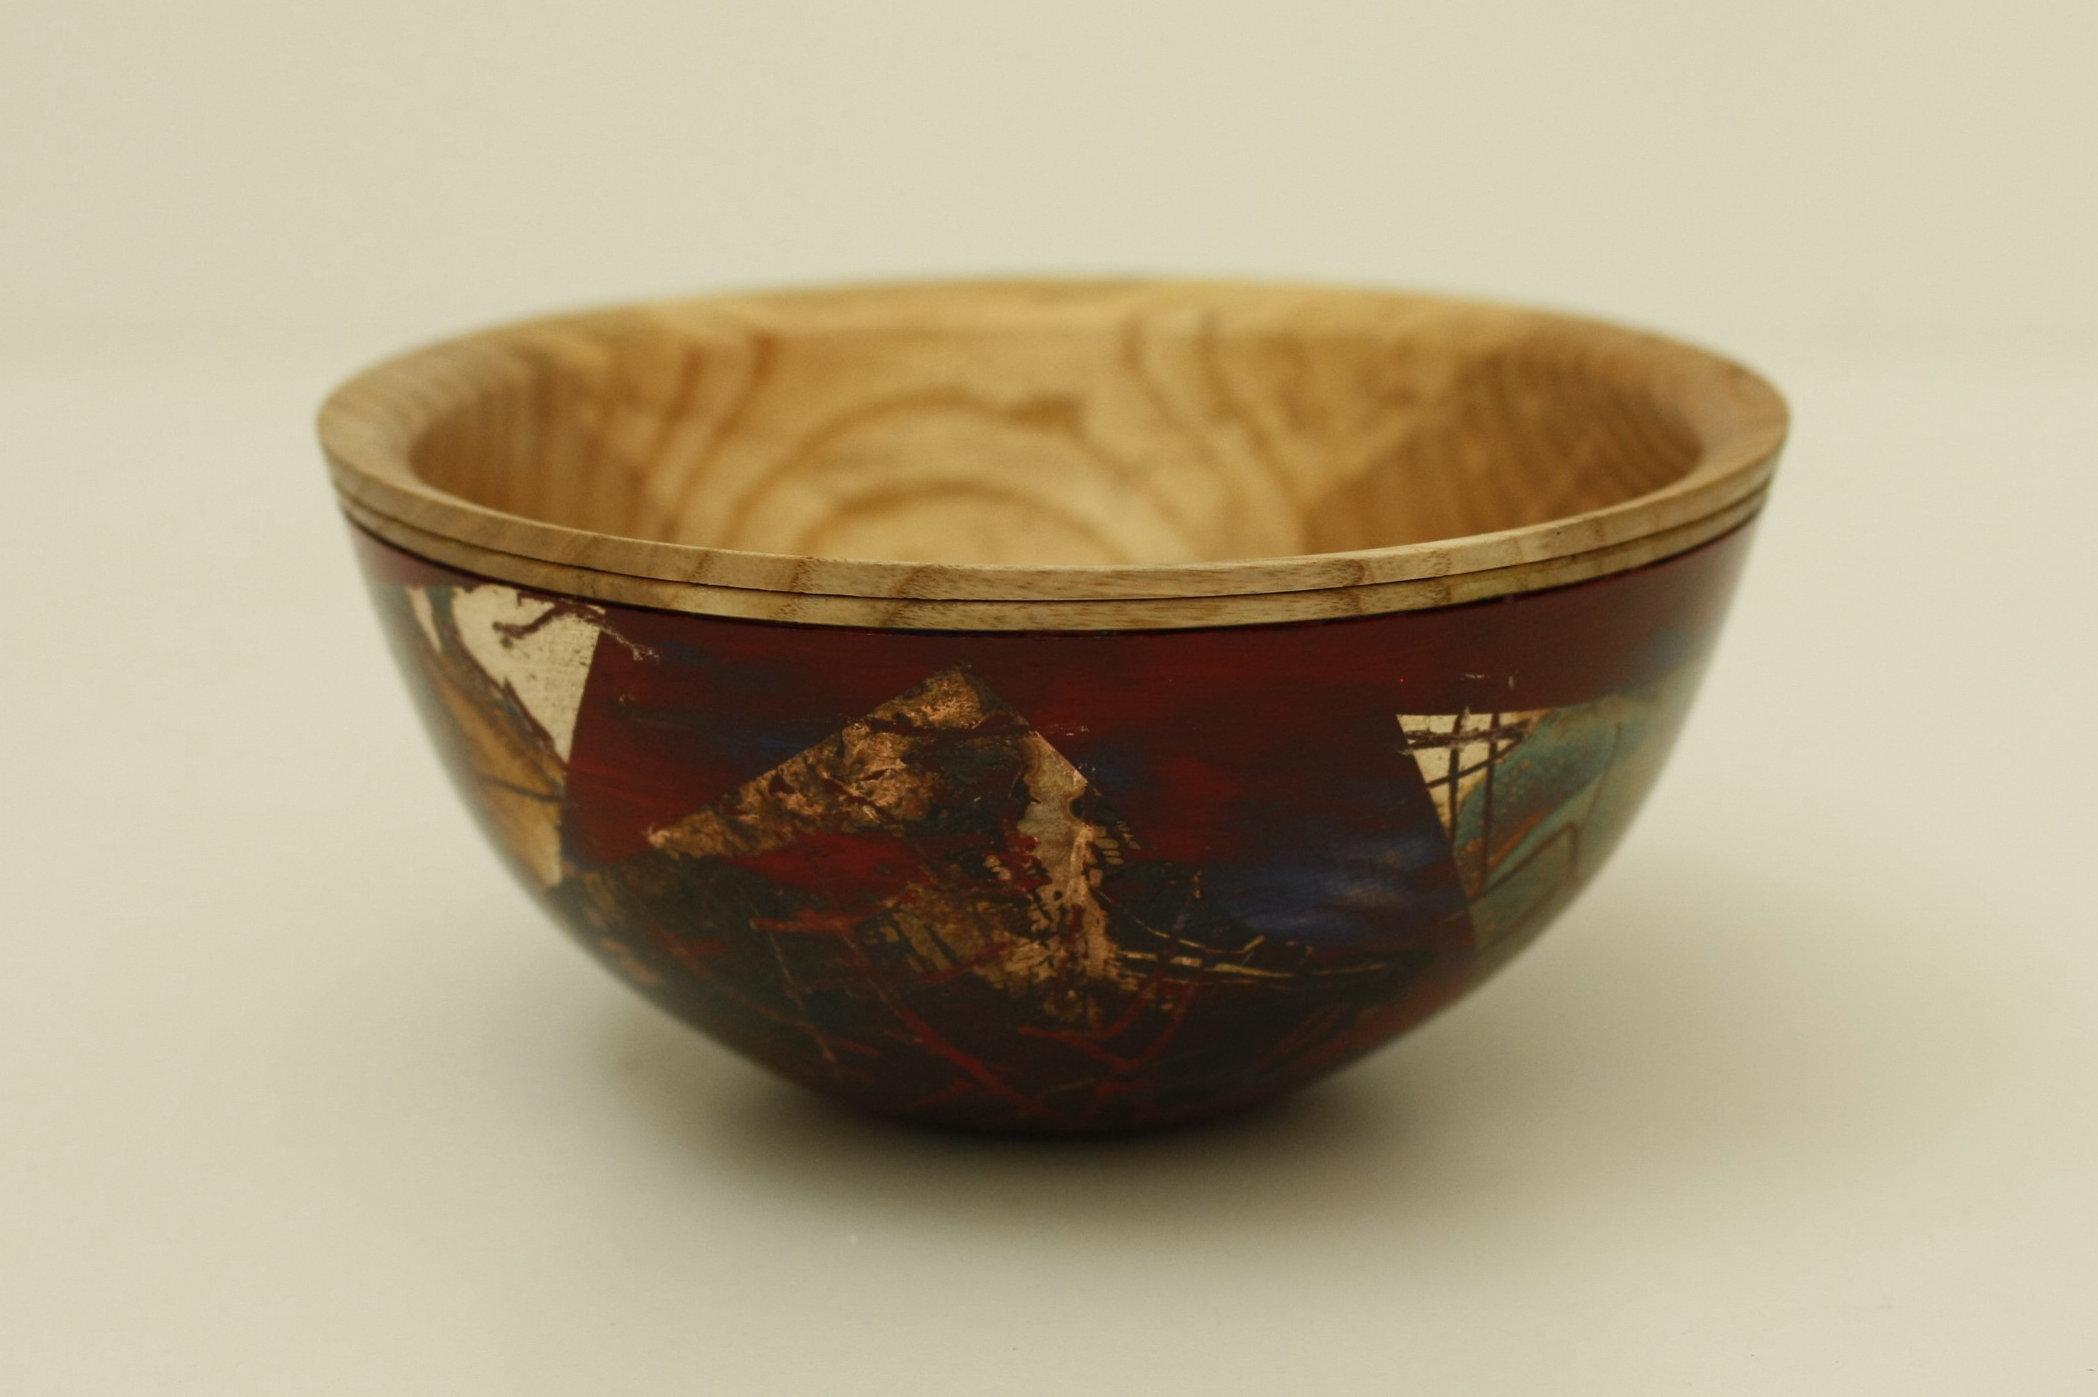 Joseph mcgill - patinated ash bowl.jpg